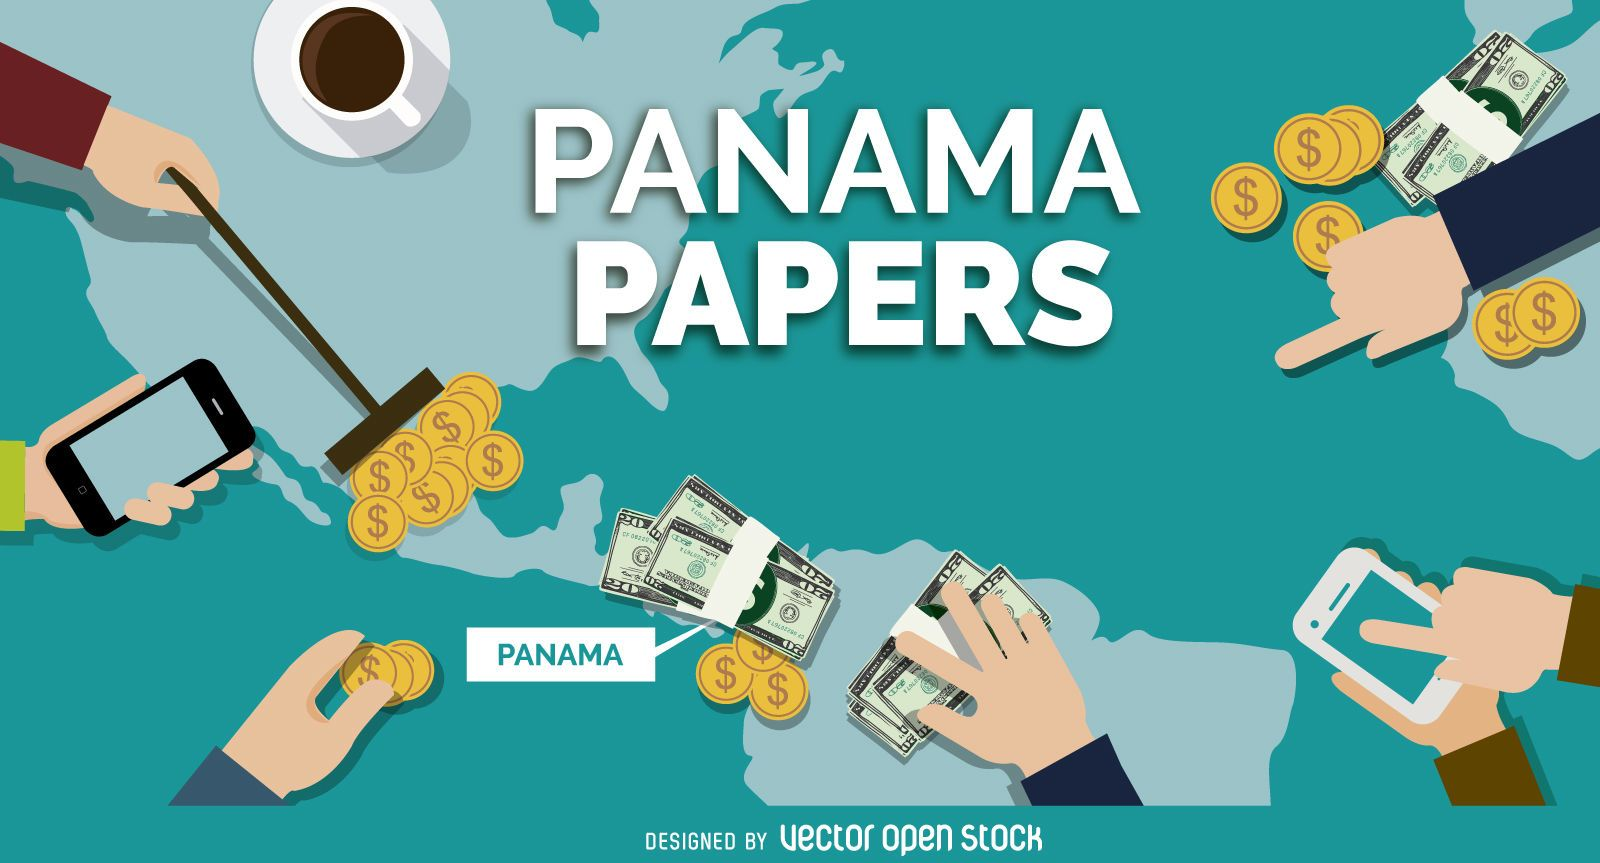 Diseño de banner de Papeles de Panamá